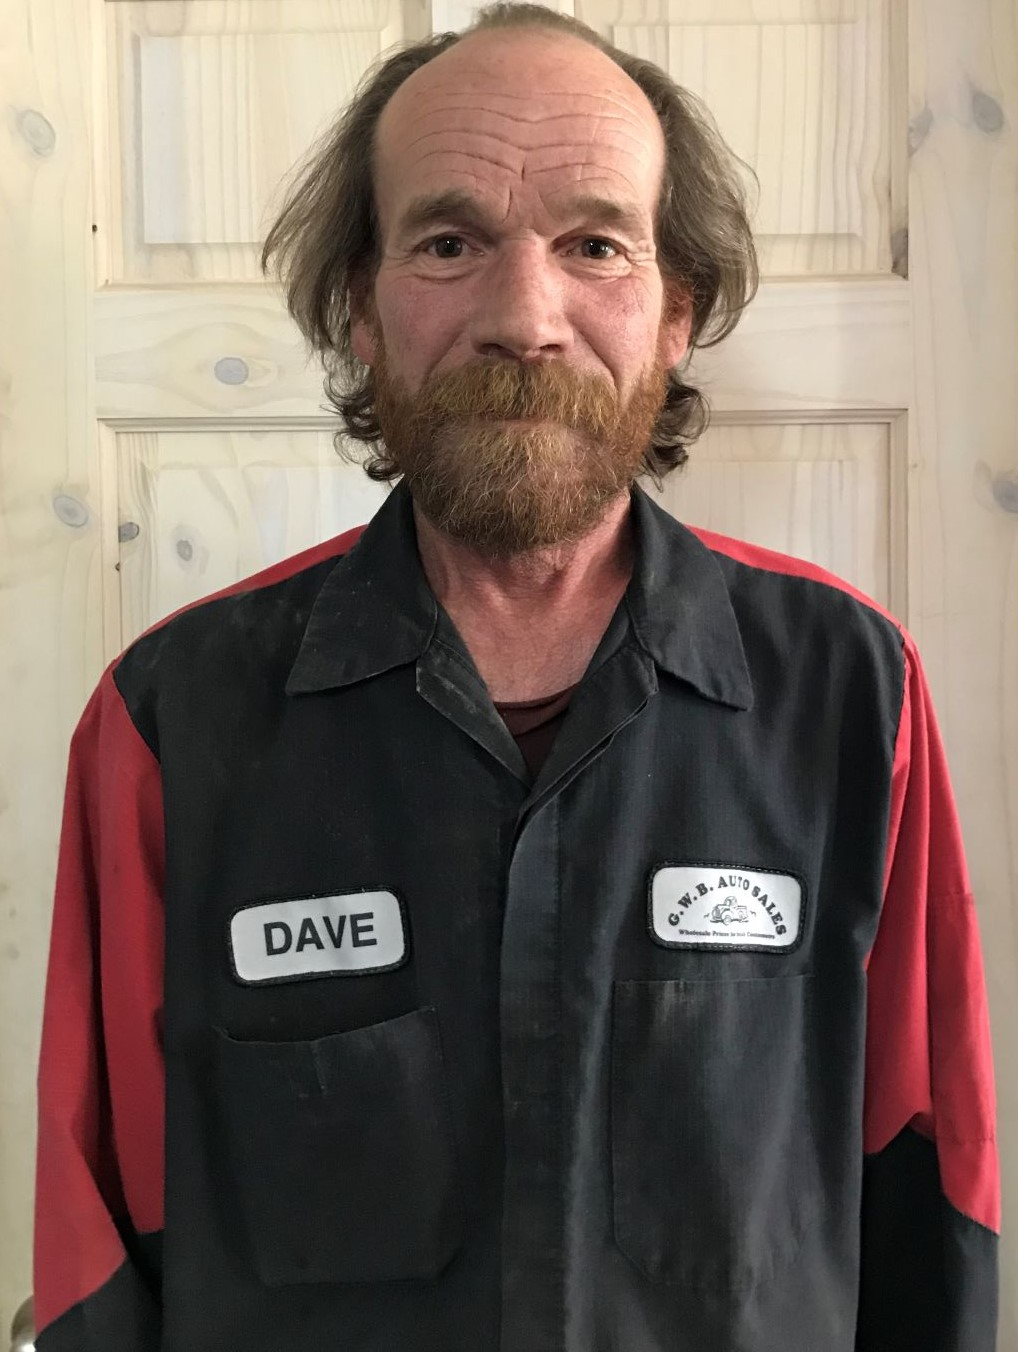 Dave1.JPG